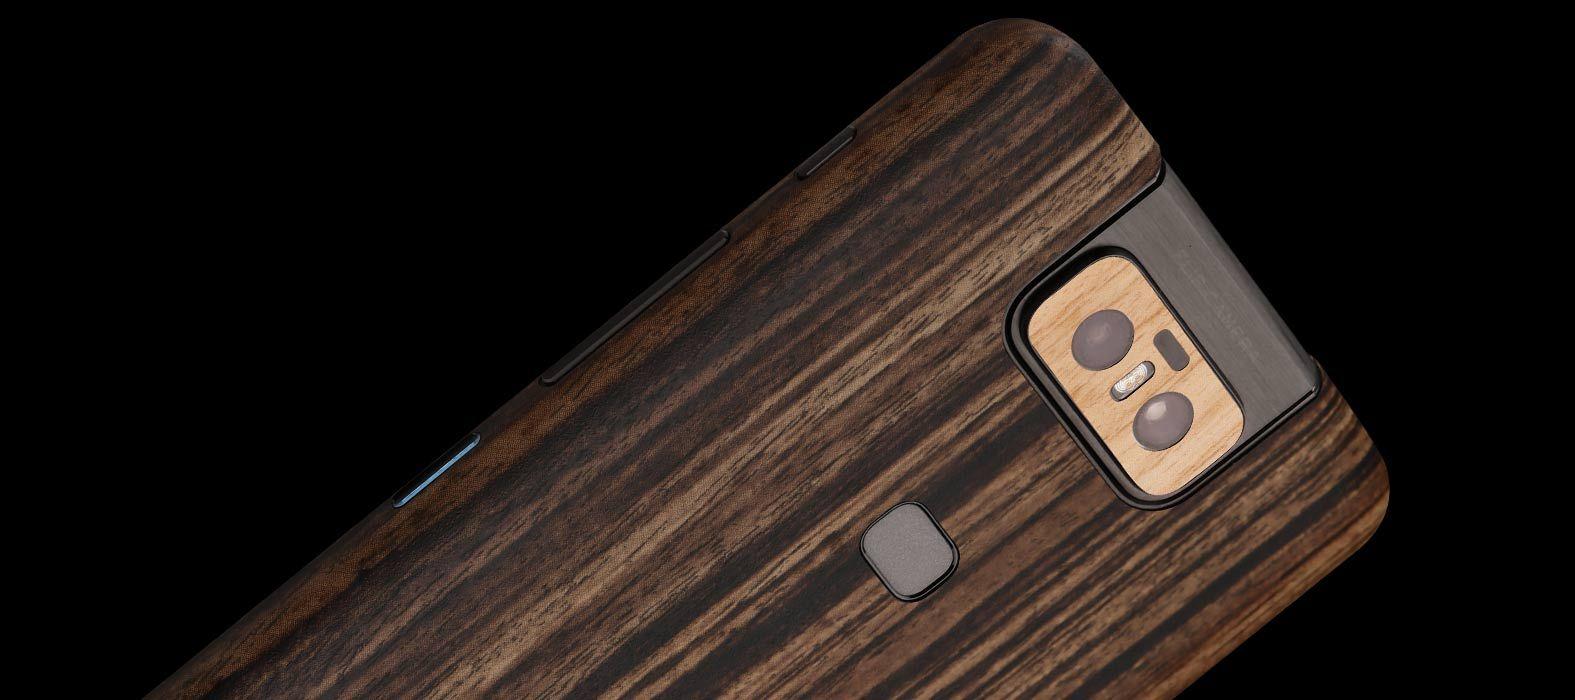 Asus Zenfone 6Z Zebra Wood Skins